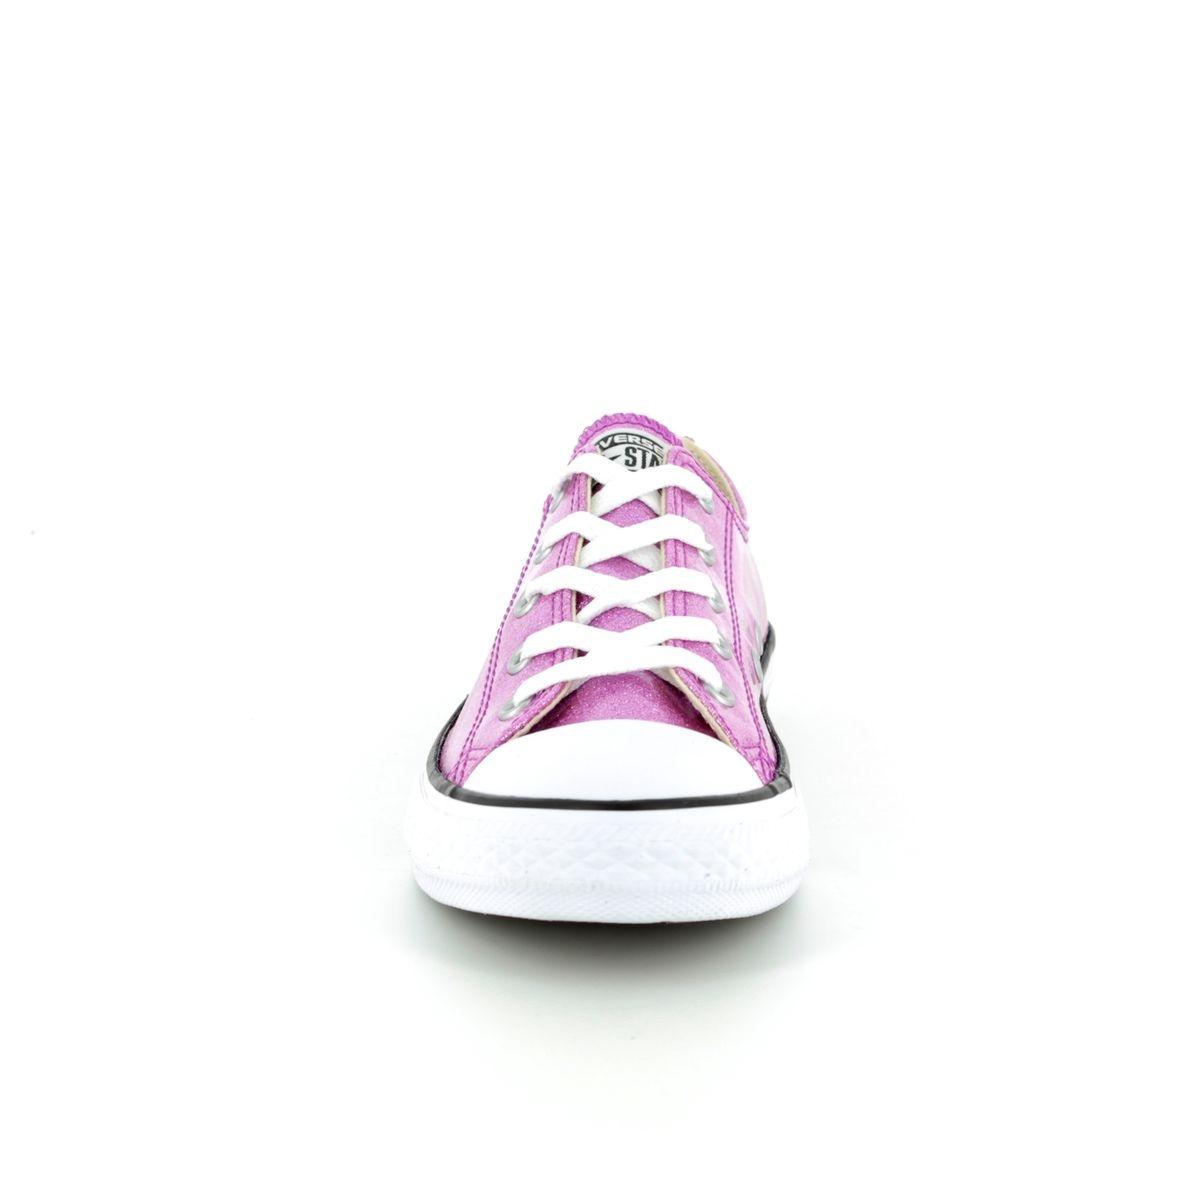 d219879979315f Converse All Star Ox Jnr 660047C Pink Glitter Lacing Trainers